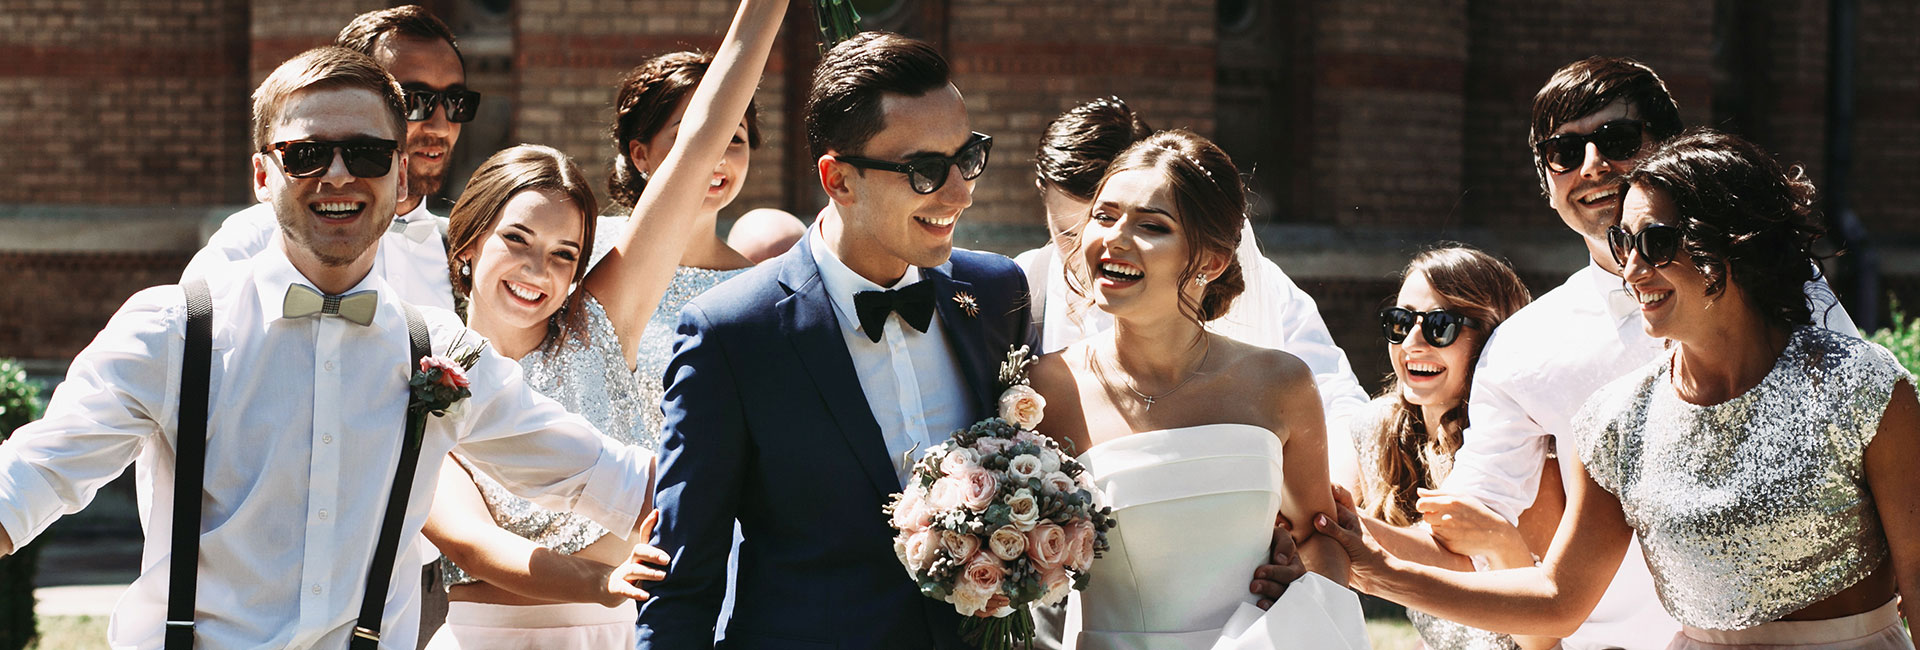 List of wedding roles